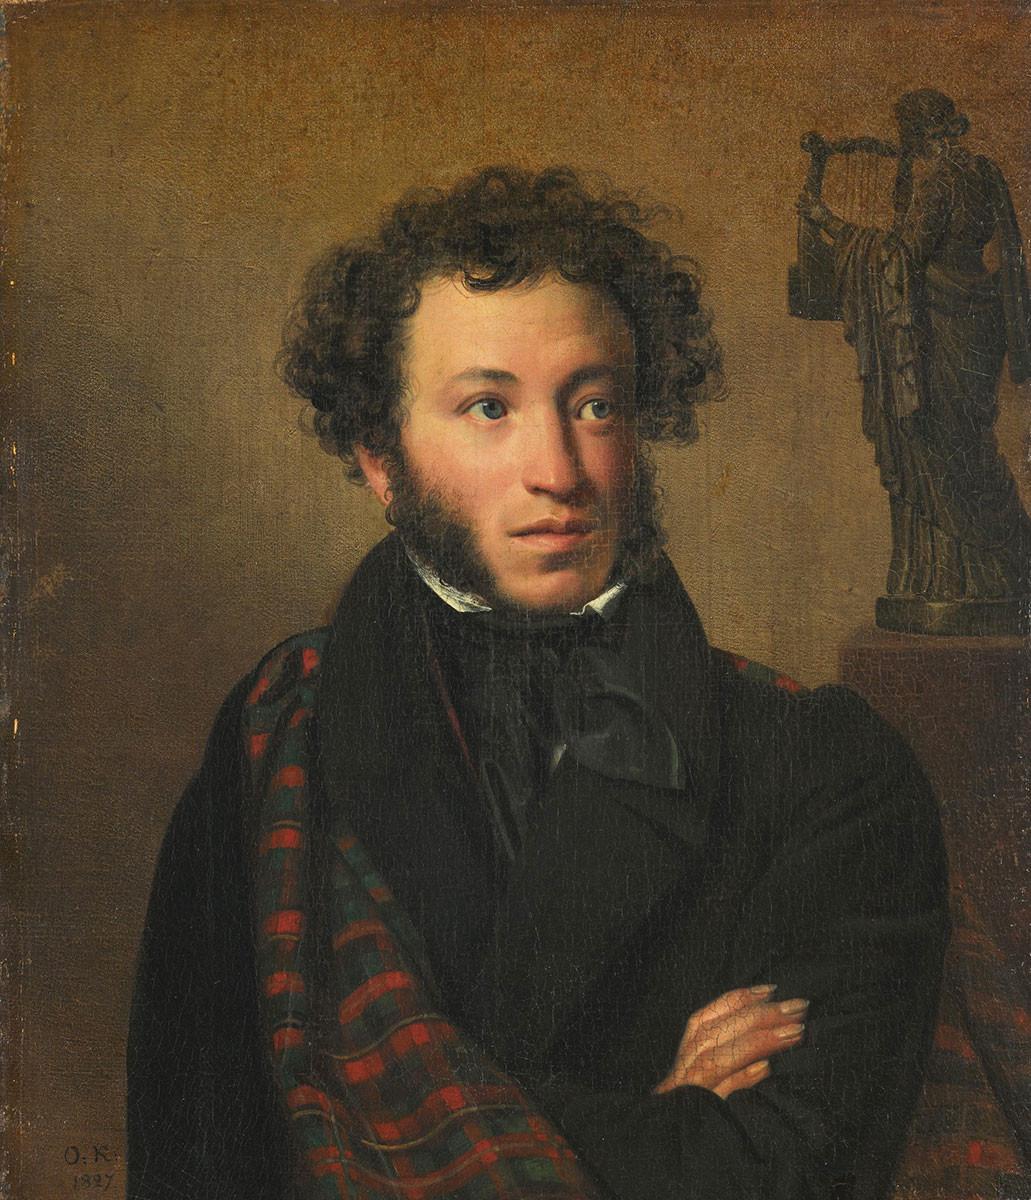 Portrait of Alexander Pushkin, by Orest Kiprensky, 1827.